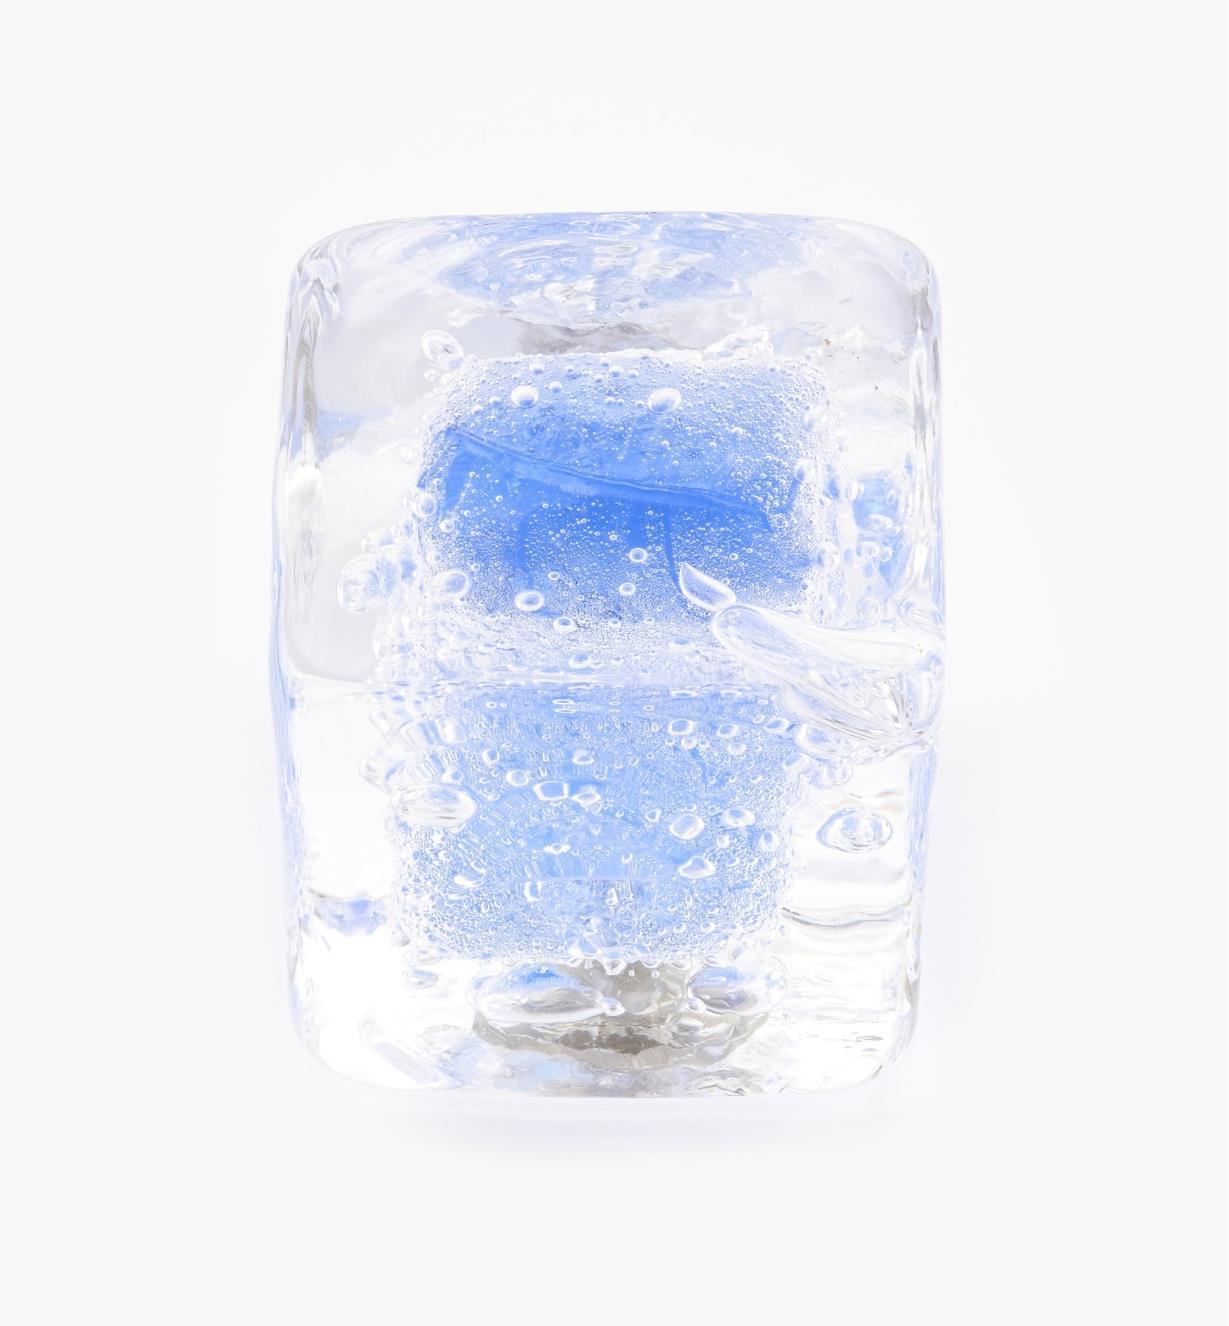 00A7703 - Bouton en verre de Murano Venezia, cobalt, 1 po